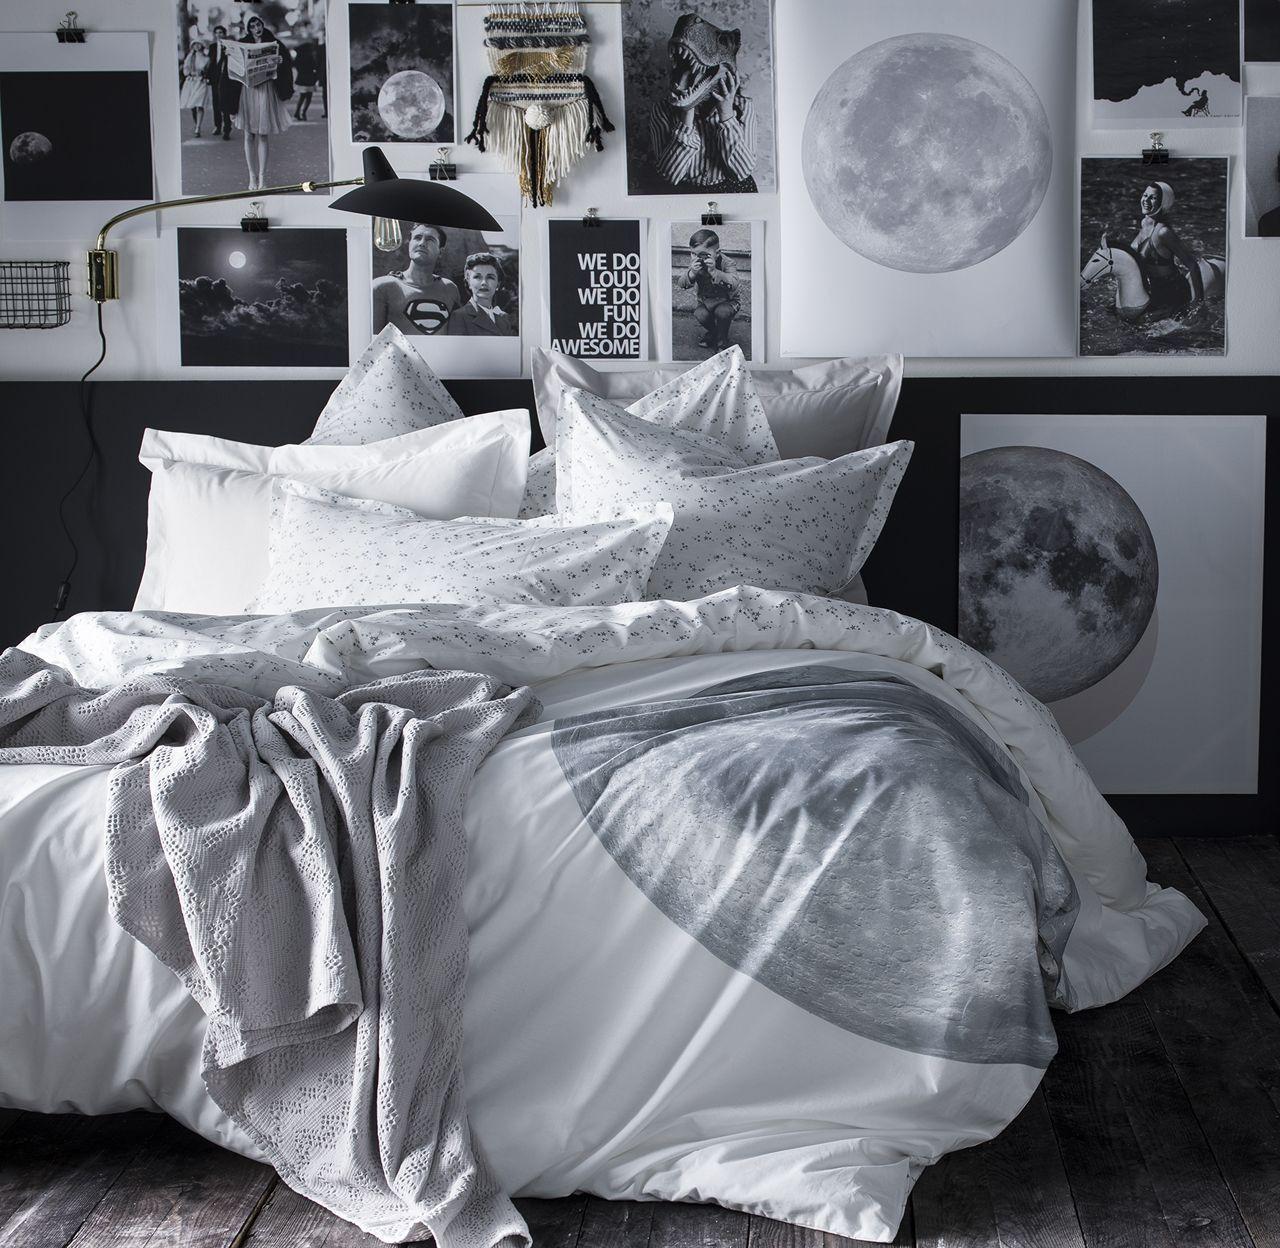 taie d 39 oreiller pleine lune motifs toiles percale 50x75. Black Bedroom Furniture Sets. Home Design Ideas